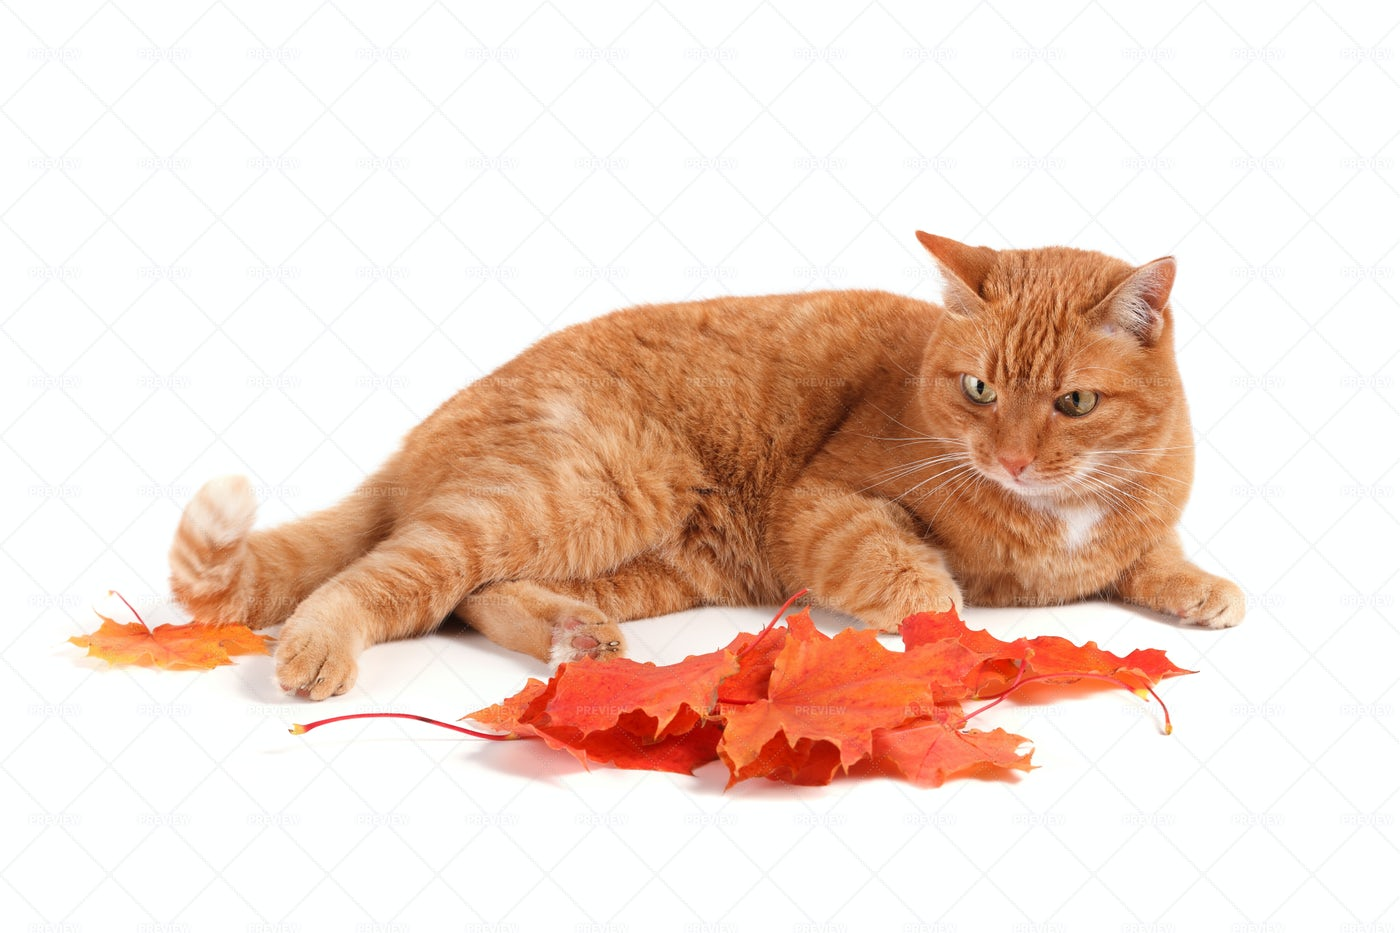 Cat Lying Beside Leaves: Stock Photos